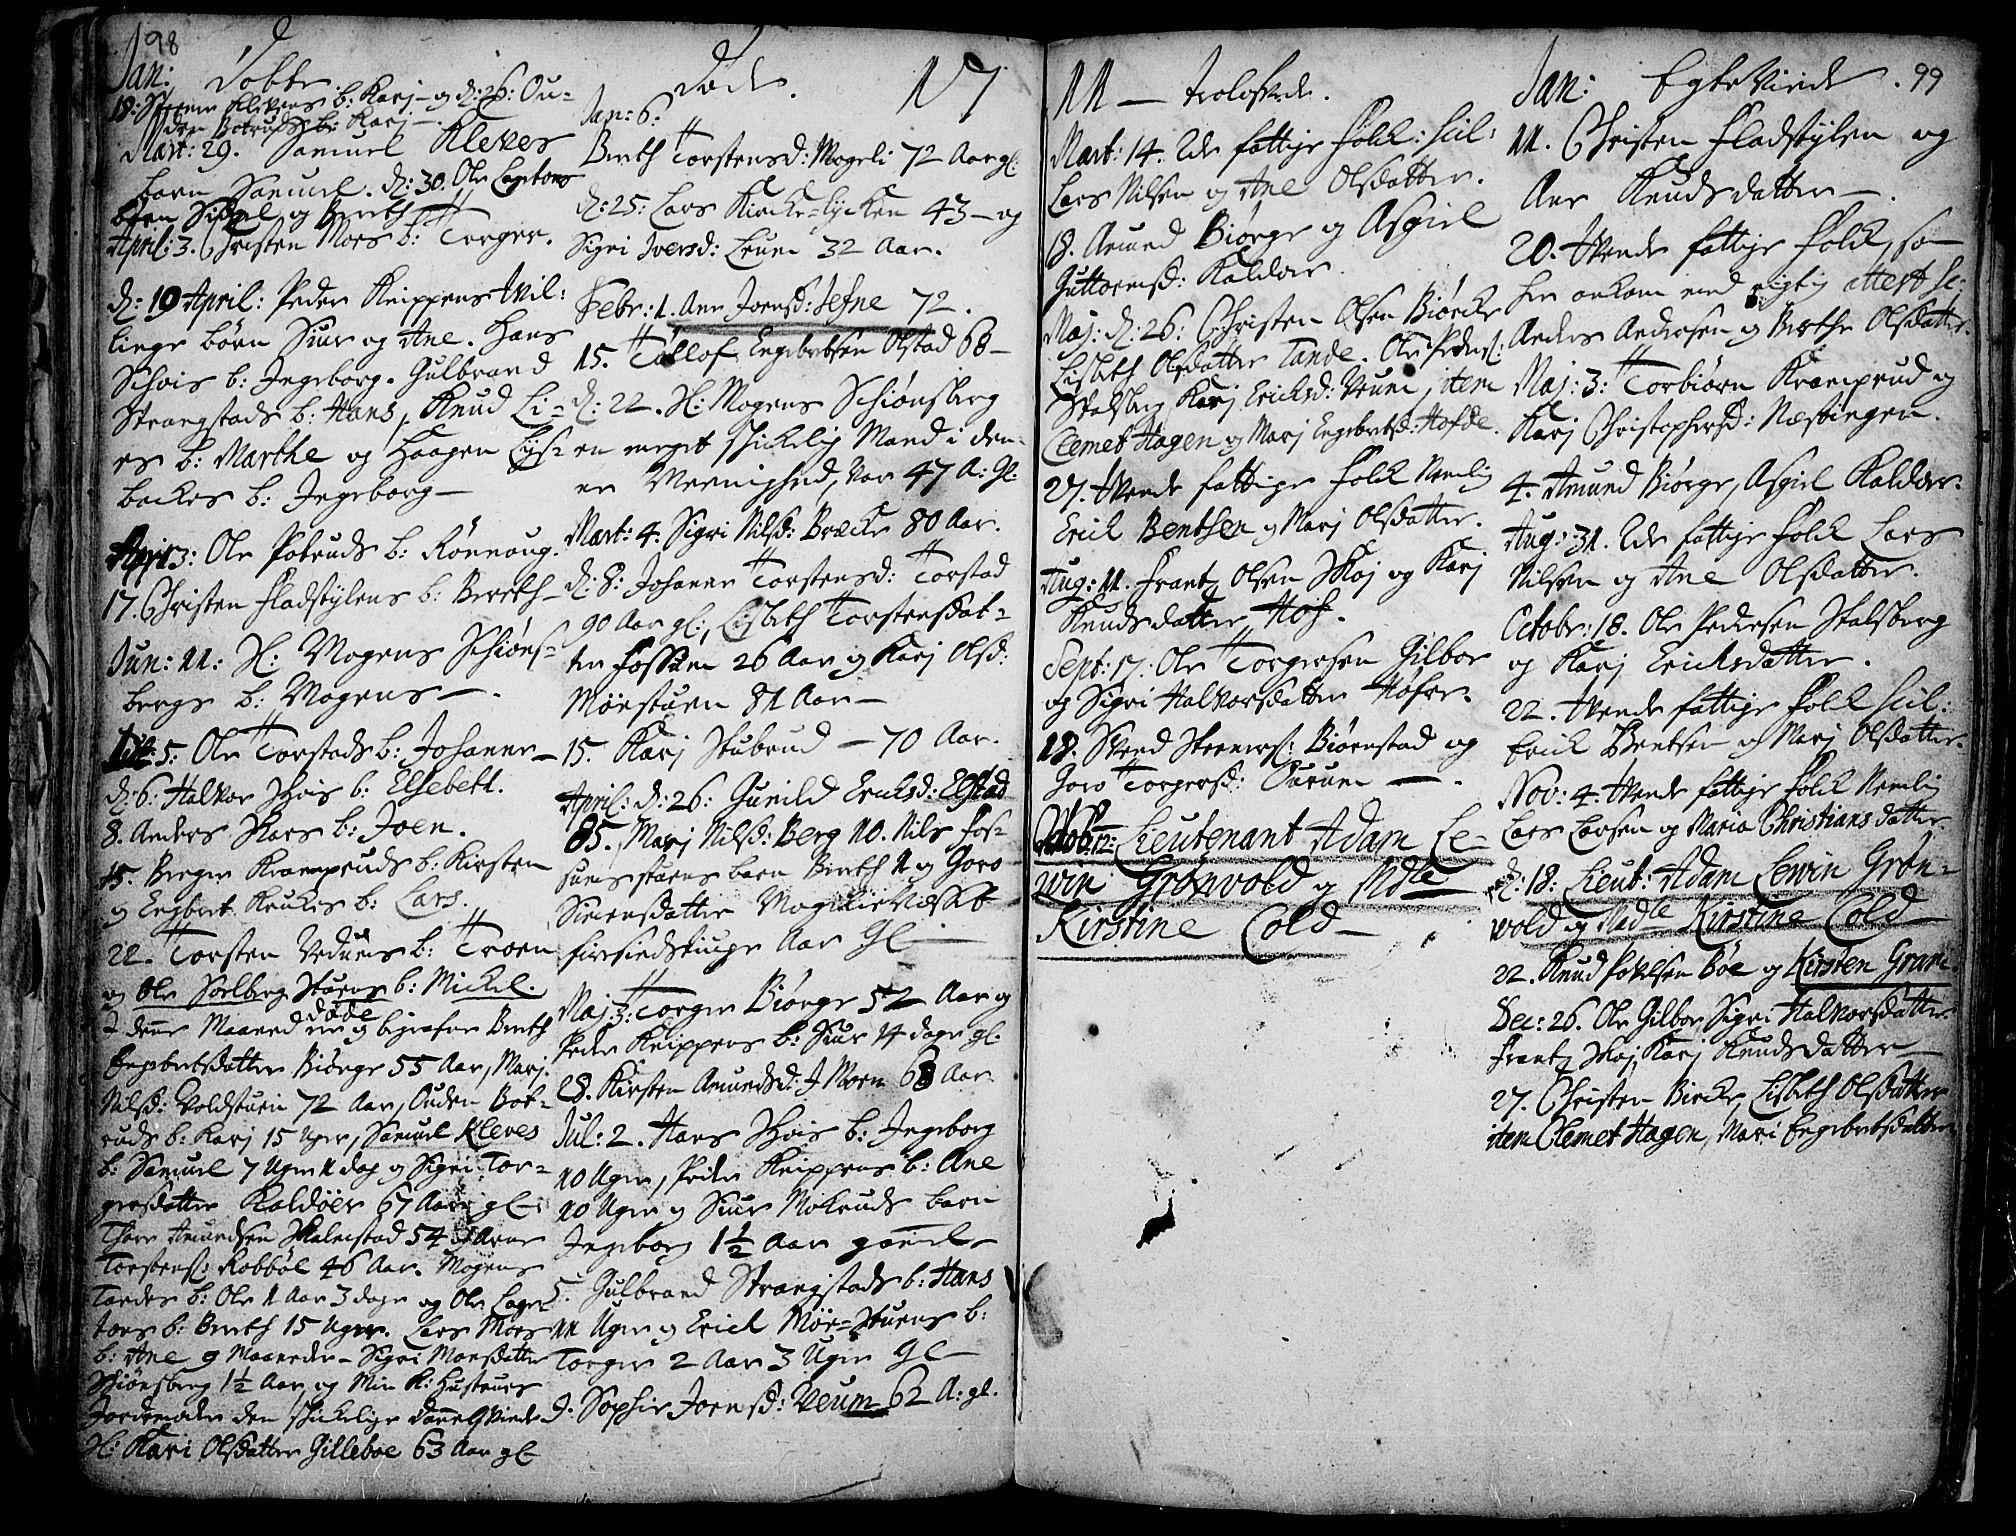 SAH, Øyer prestekontor, Ministerialbok nr. 1, 1671-1727, s. 98-99